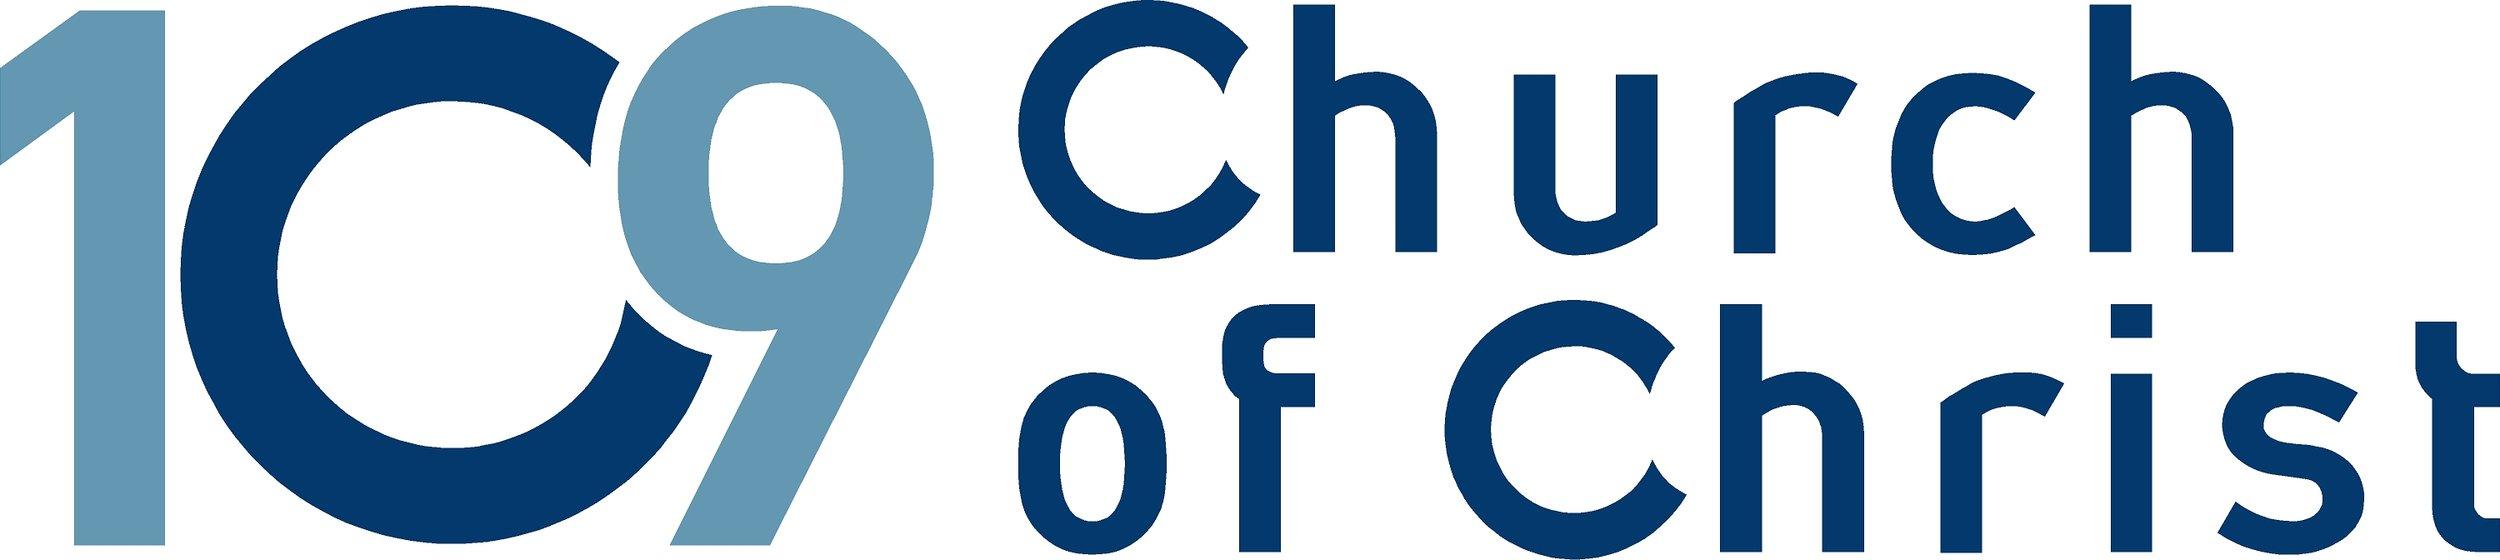 109 logo.jpg